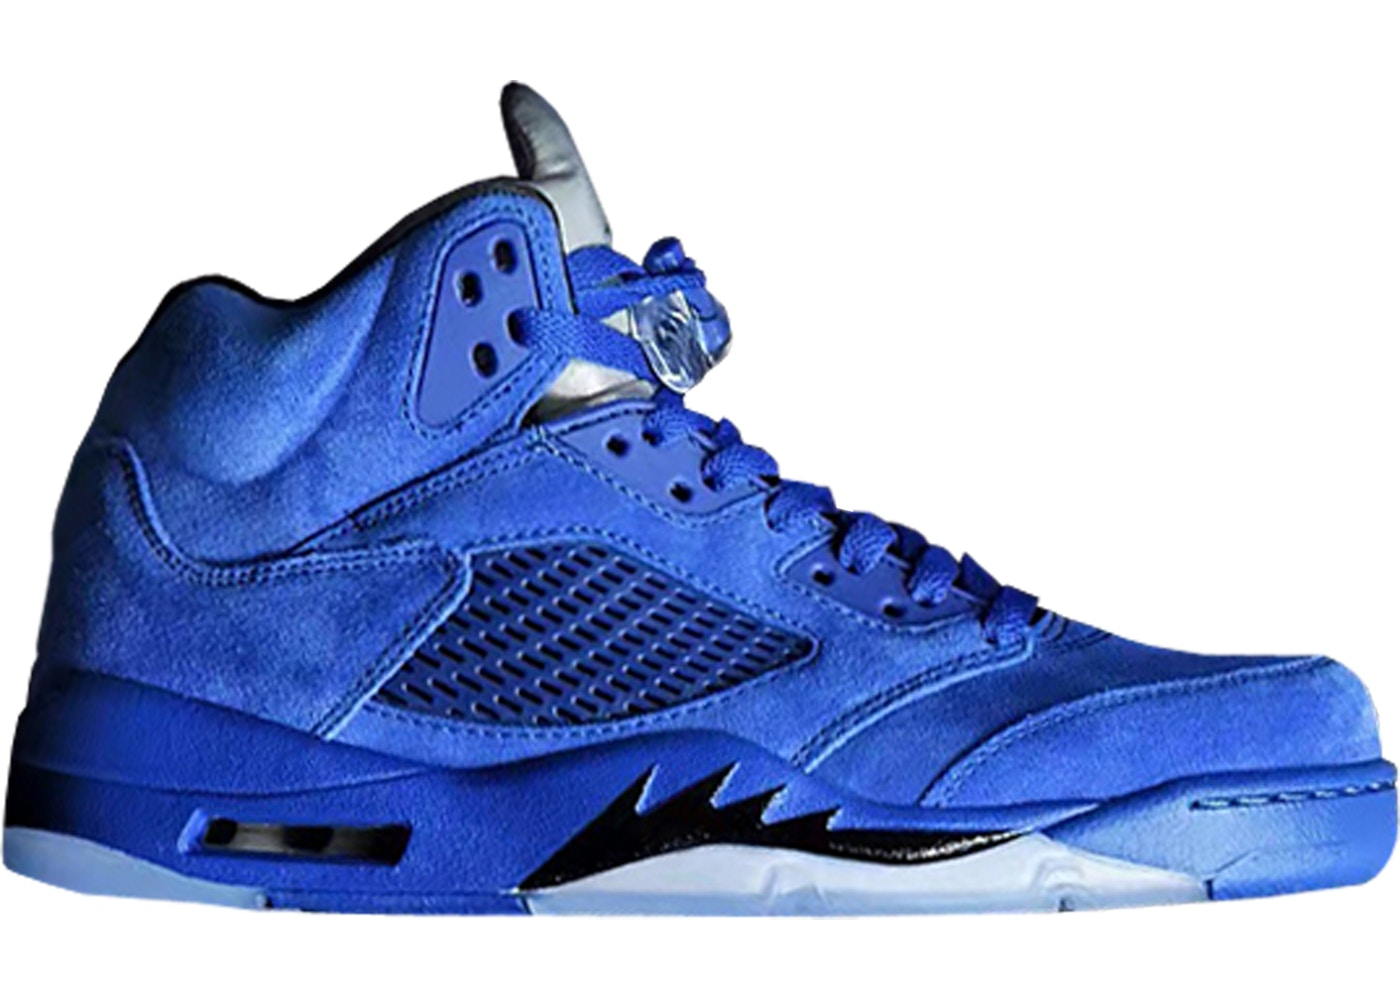 jordan 5 retro blue suede 136027 401